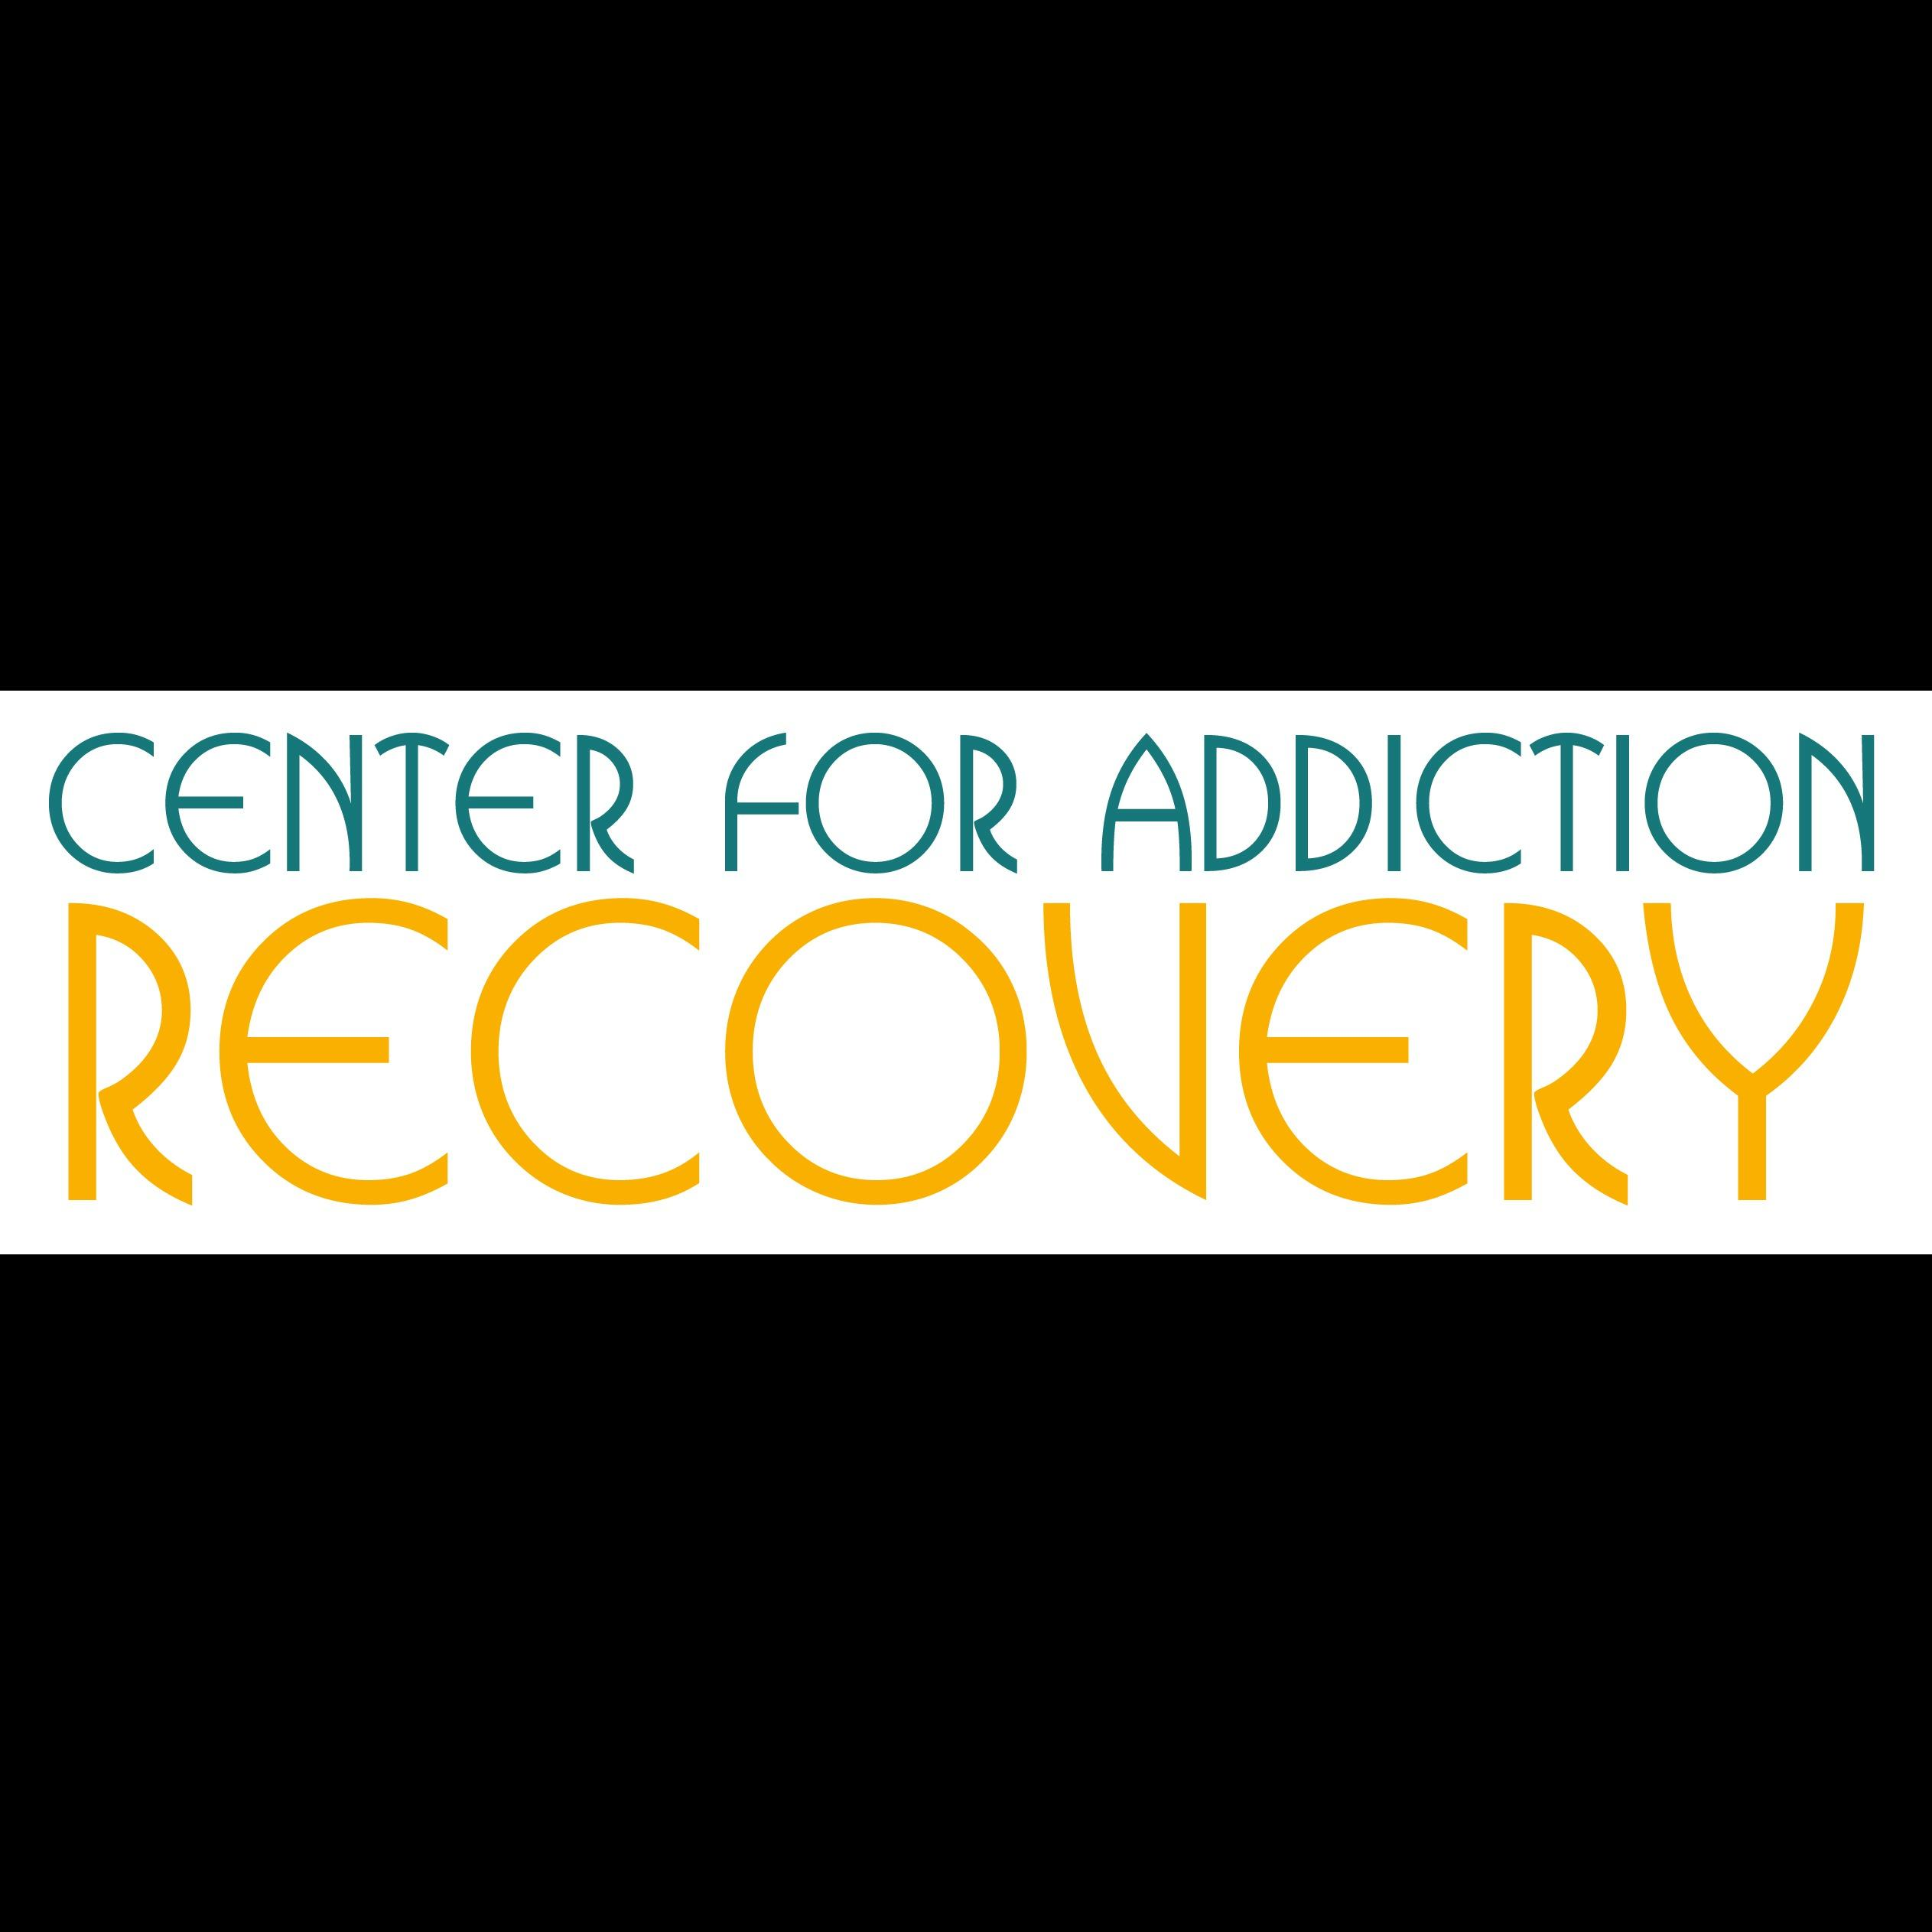 Center For Addiction Recovery - Fort Pierce, FL 34981 - (772)429-3199   ShowMeLocal.com